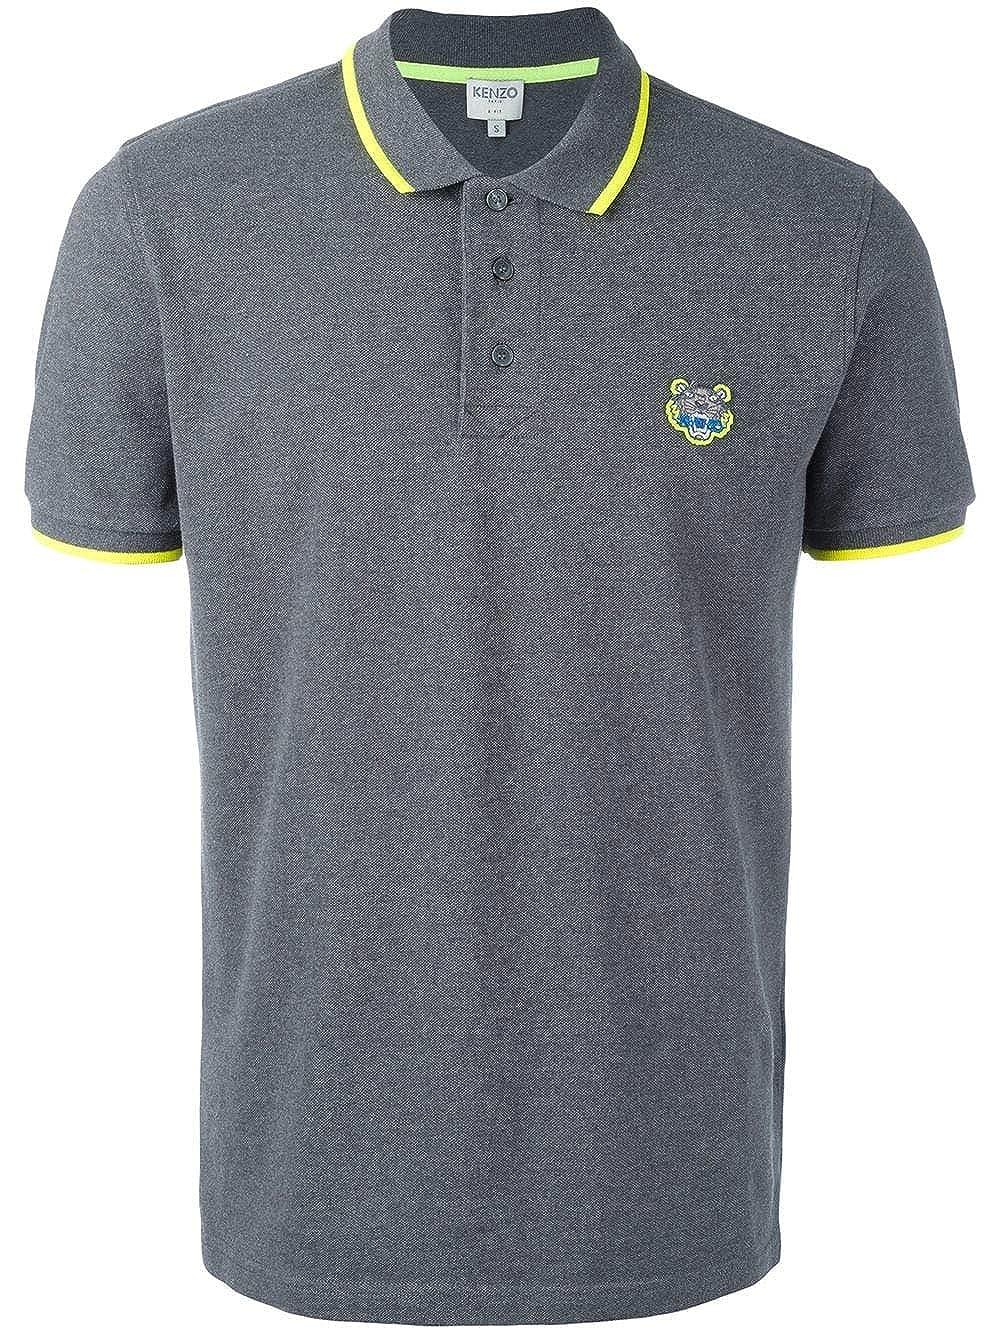 9426aa6cf7 Kenzo Men's White Tiger Head Polo Shirt Dark Grey at Amazon Men's Clothing  store: